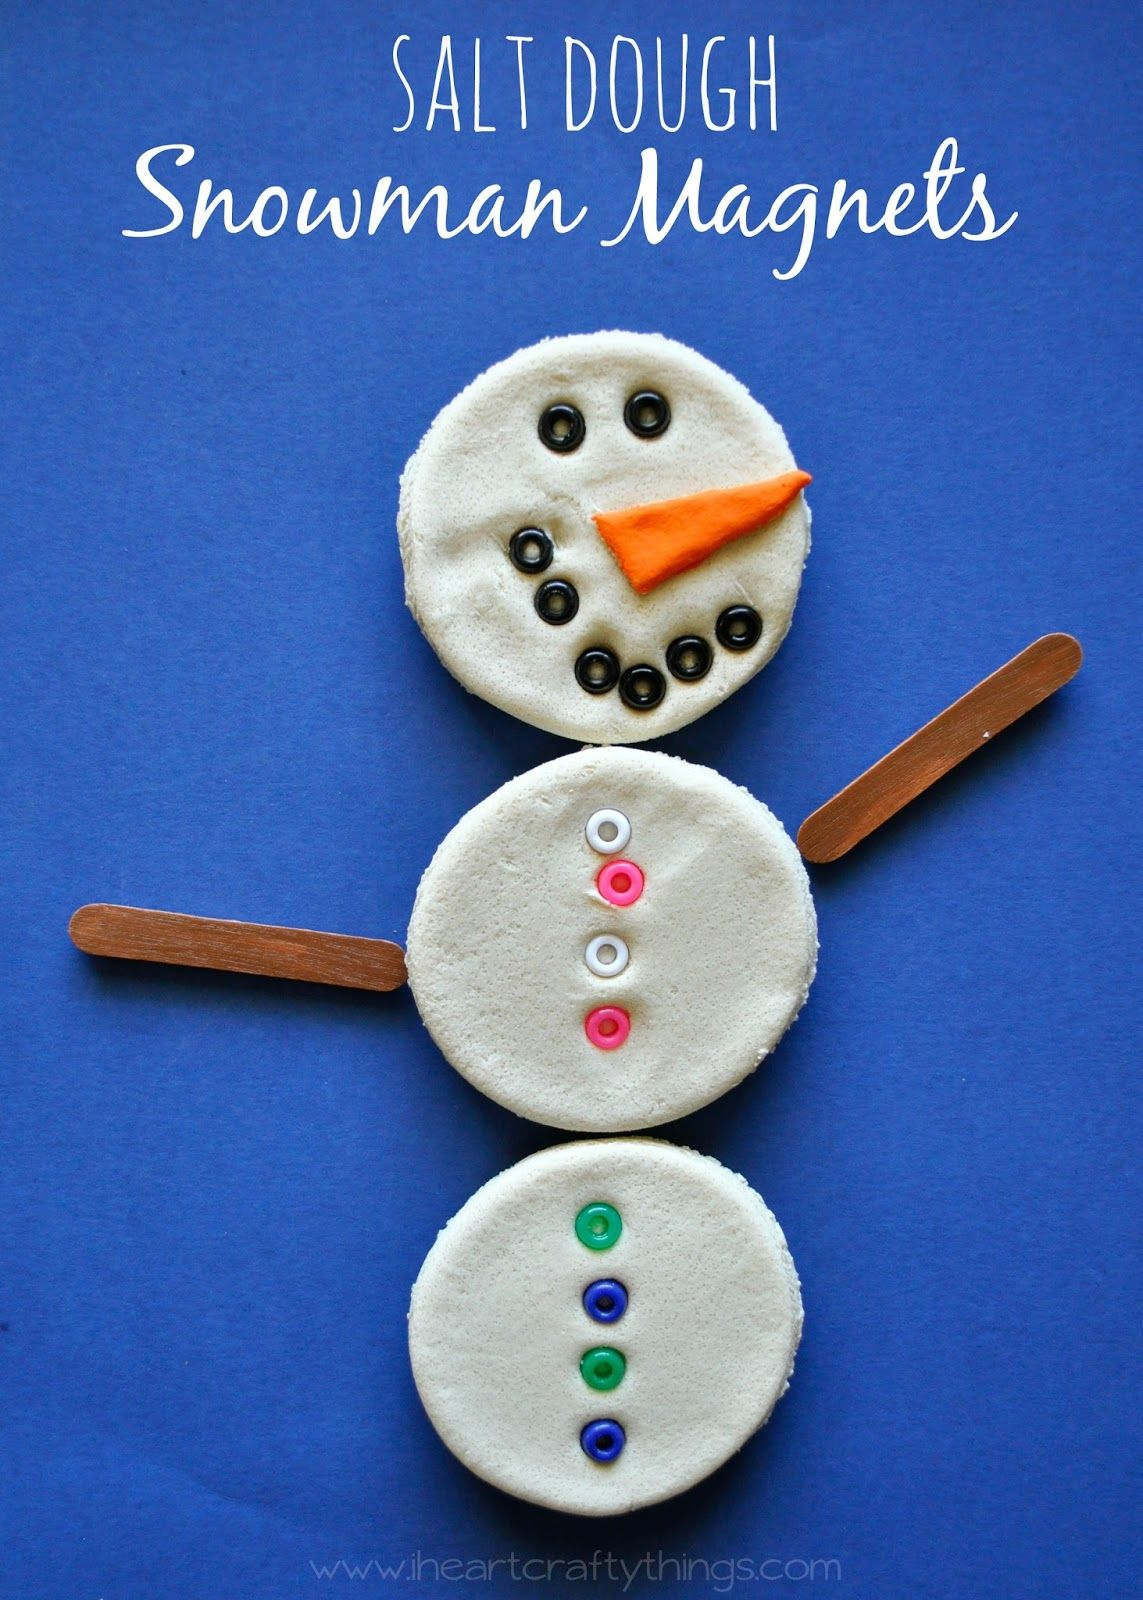 I HEART CRAFTY THINGS: Snowman Salt Dough Magnets